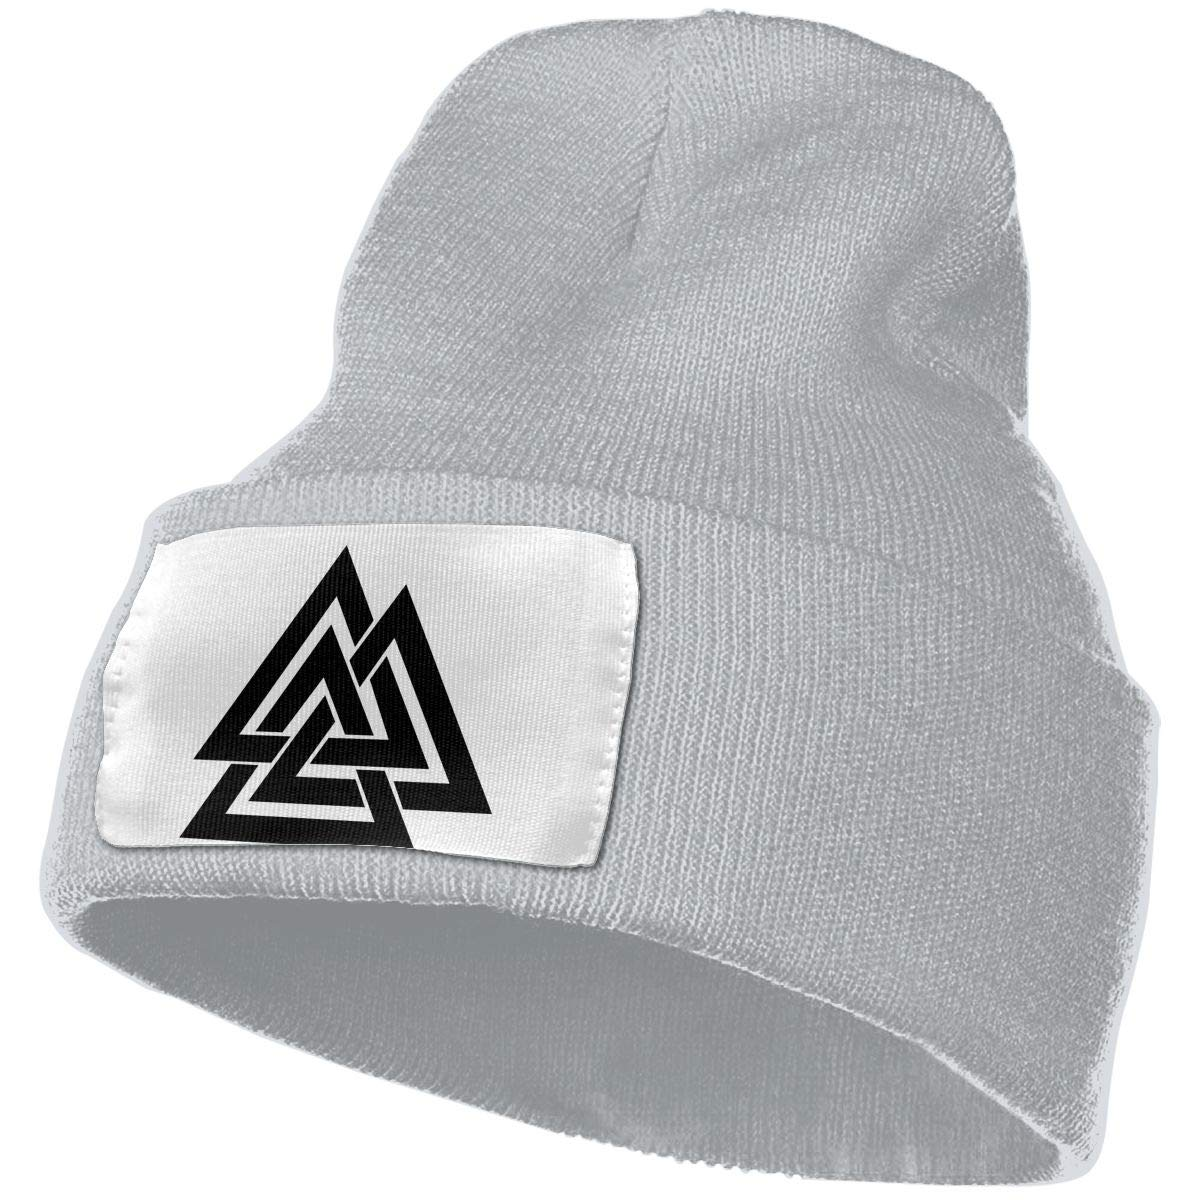 Valknut Men/&Women Warm Winter Knit Plain Beanie Hat Skull Cap Acrylic Knit Cuff Hat